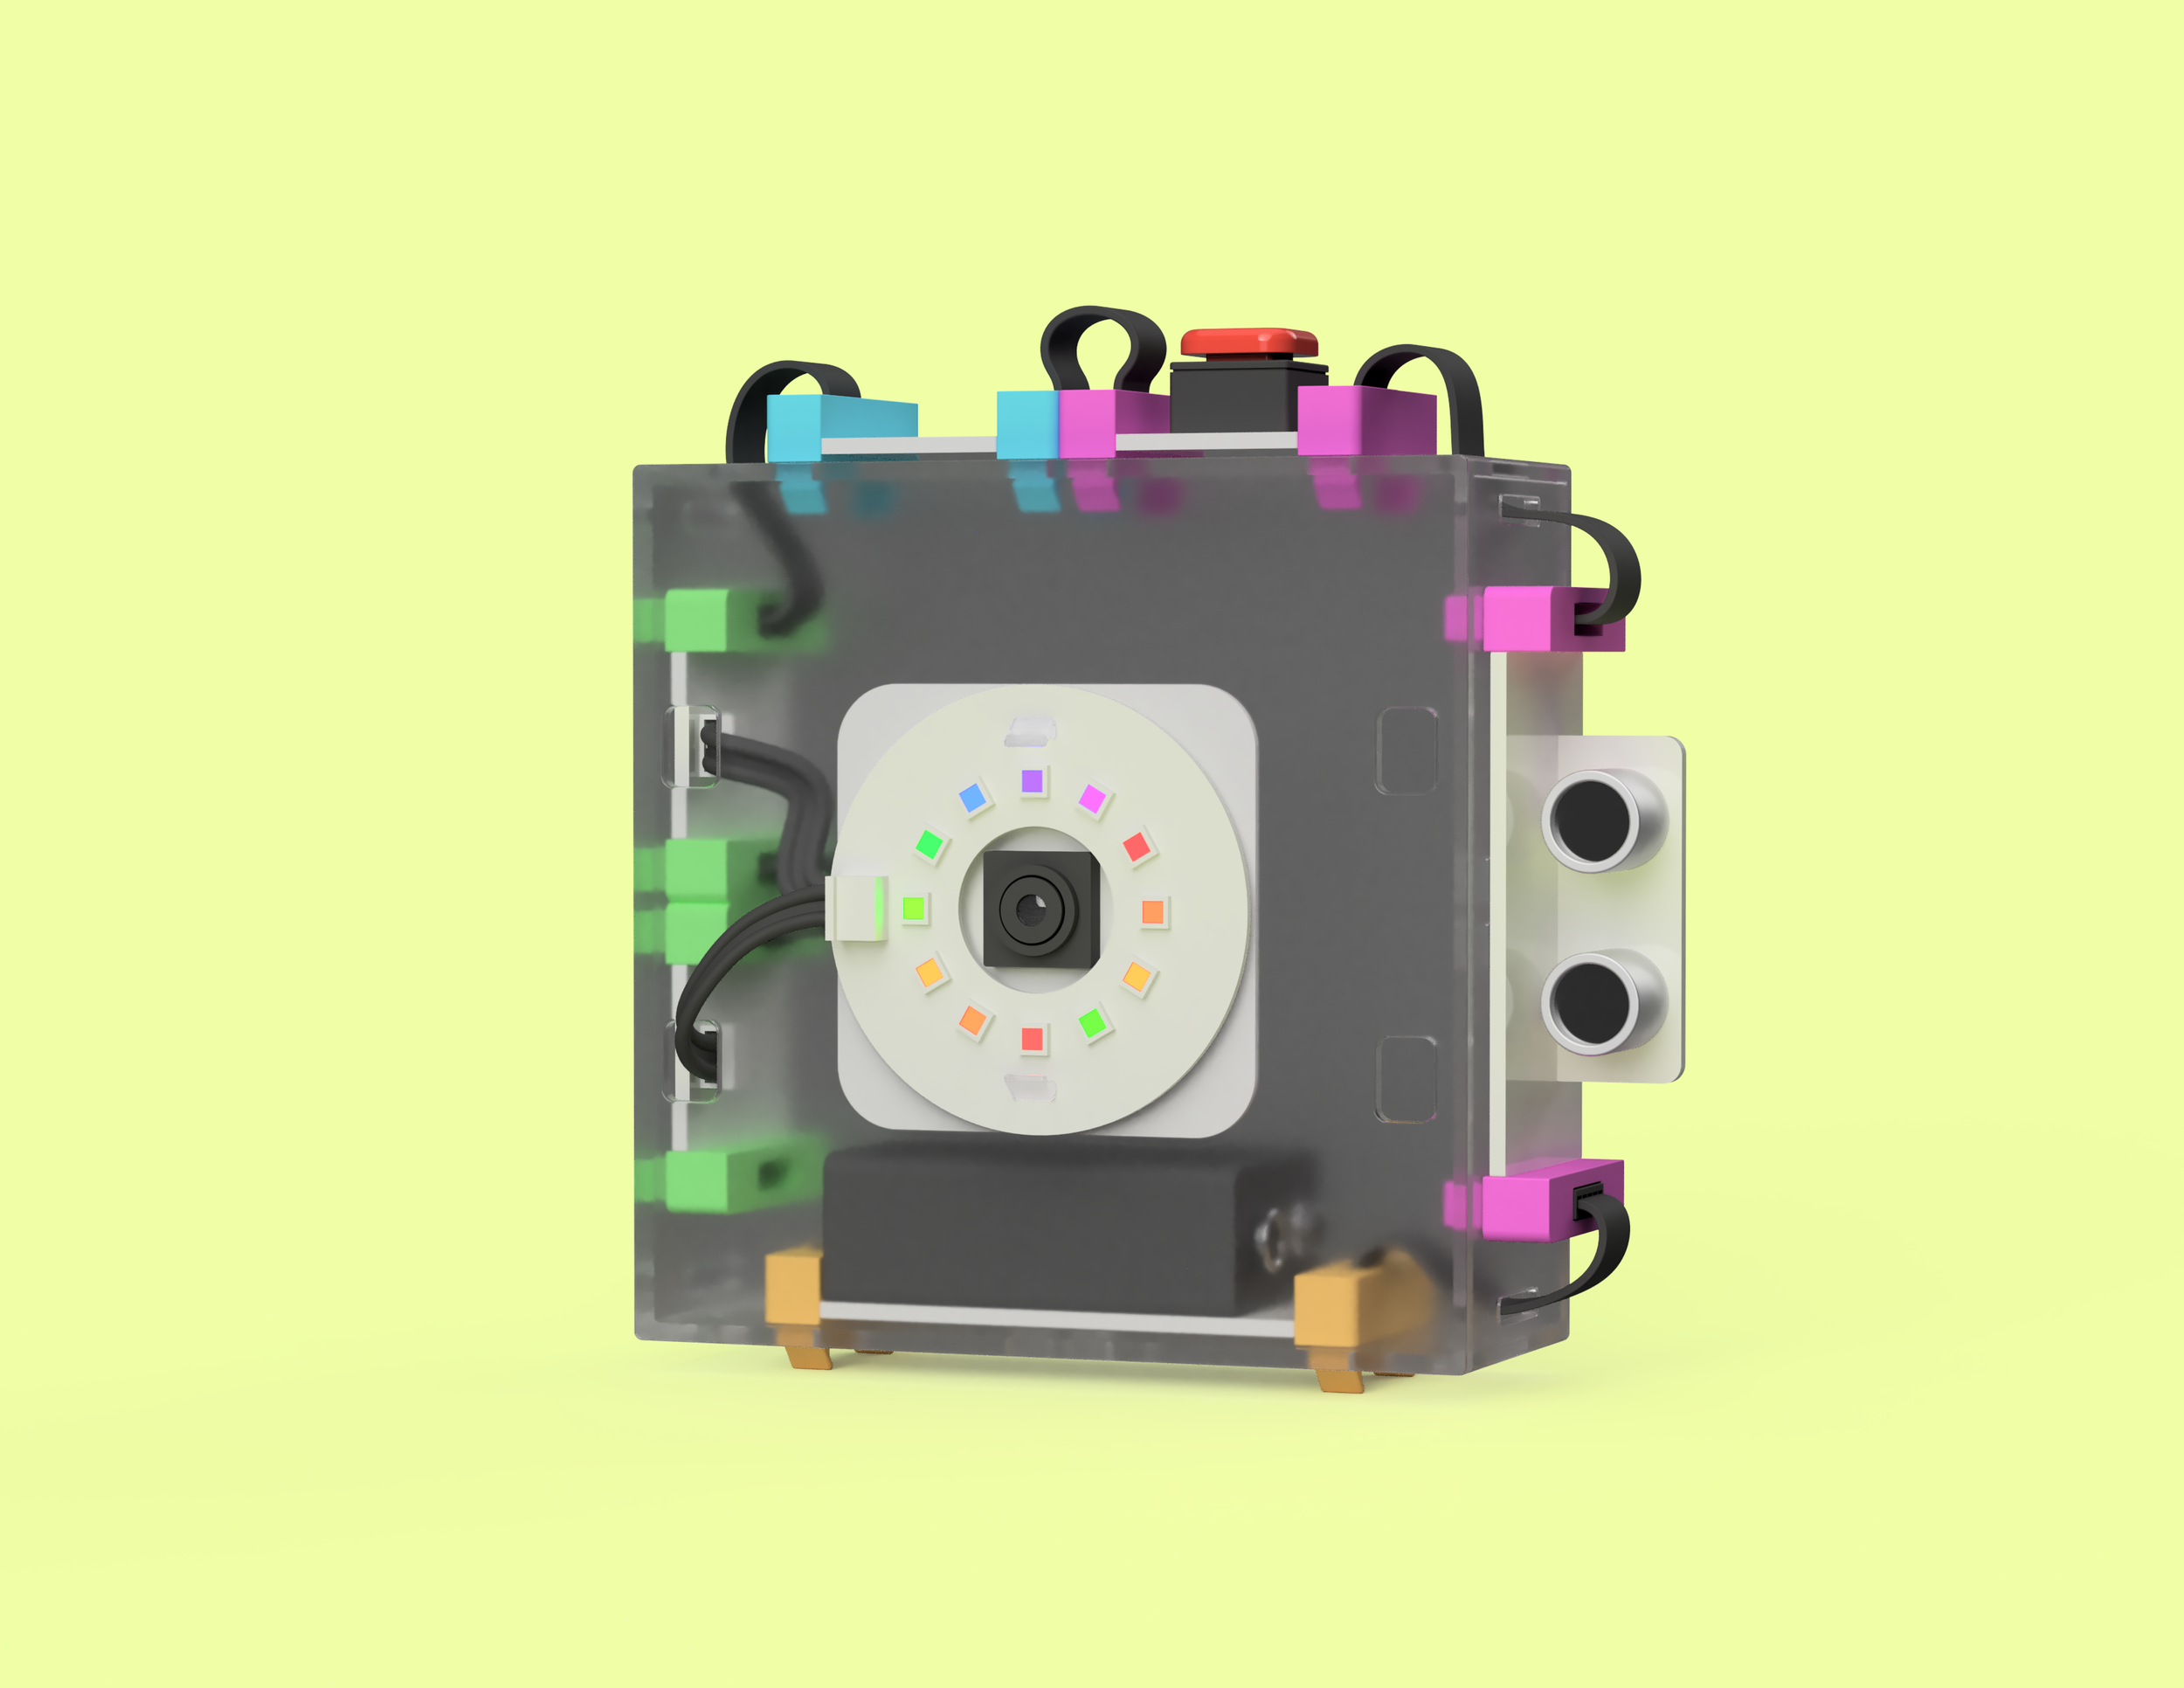 03_Camera_board_design.png